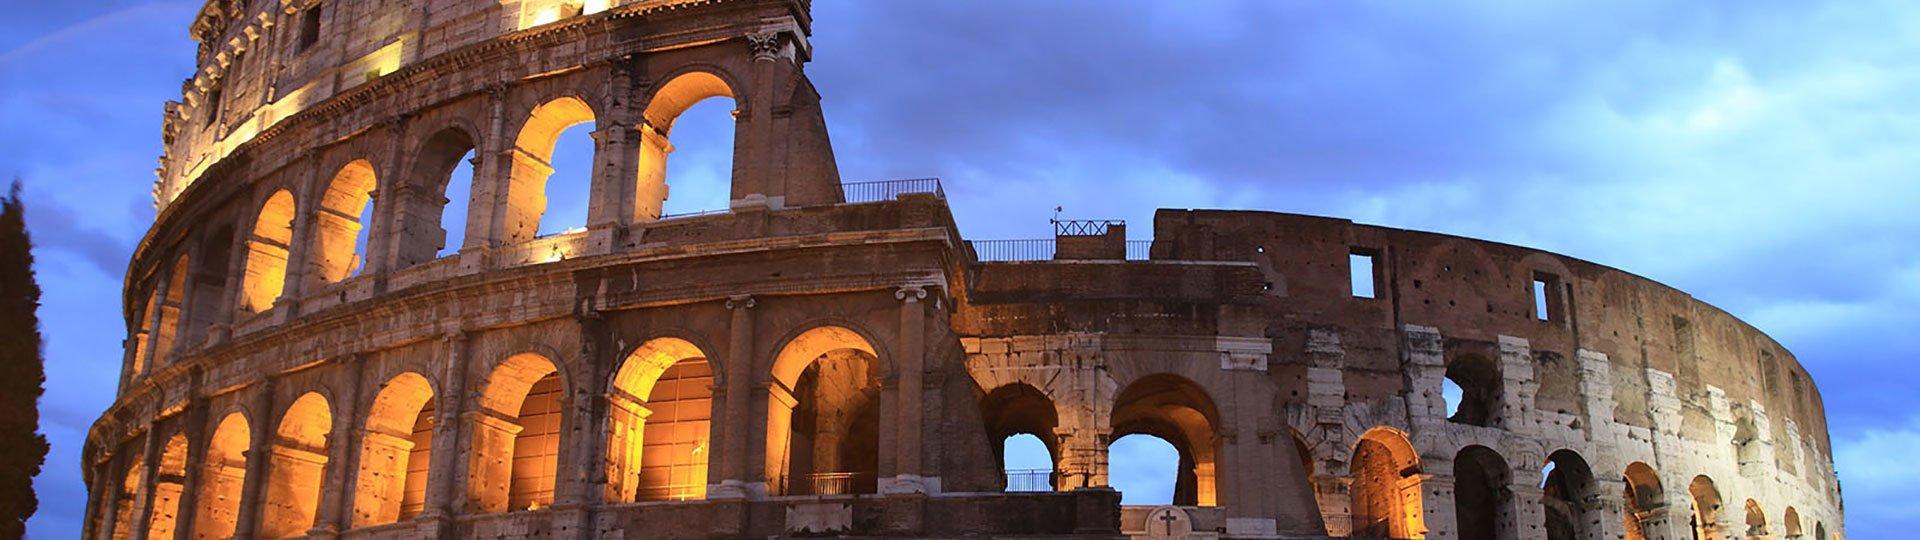 Early bird tour of Colosseum, Forum & Palatine